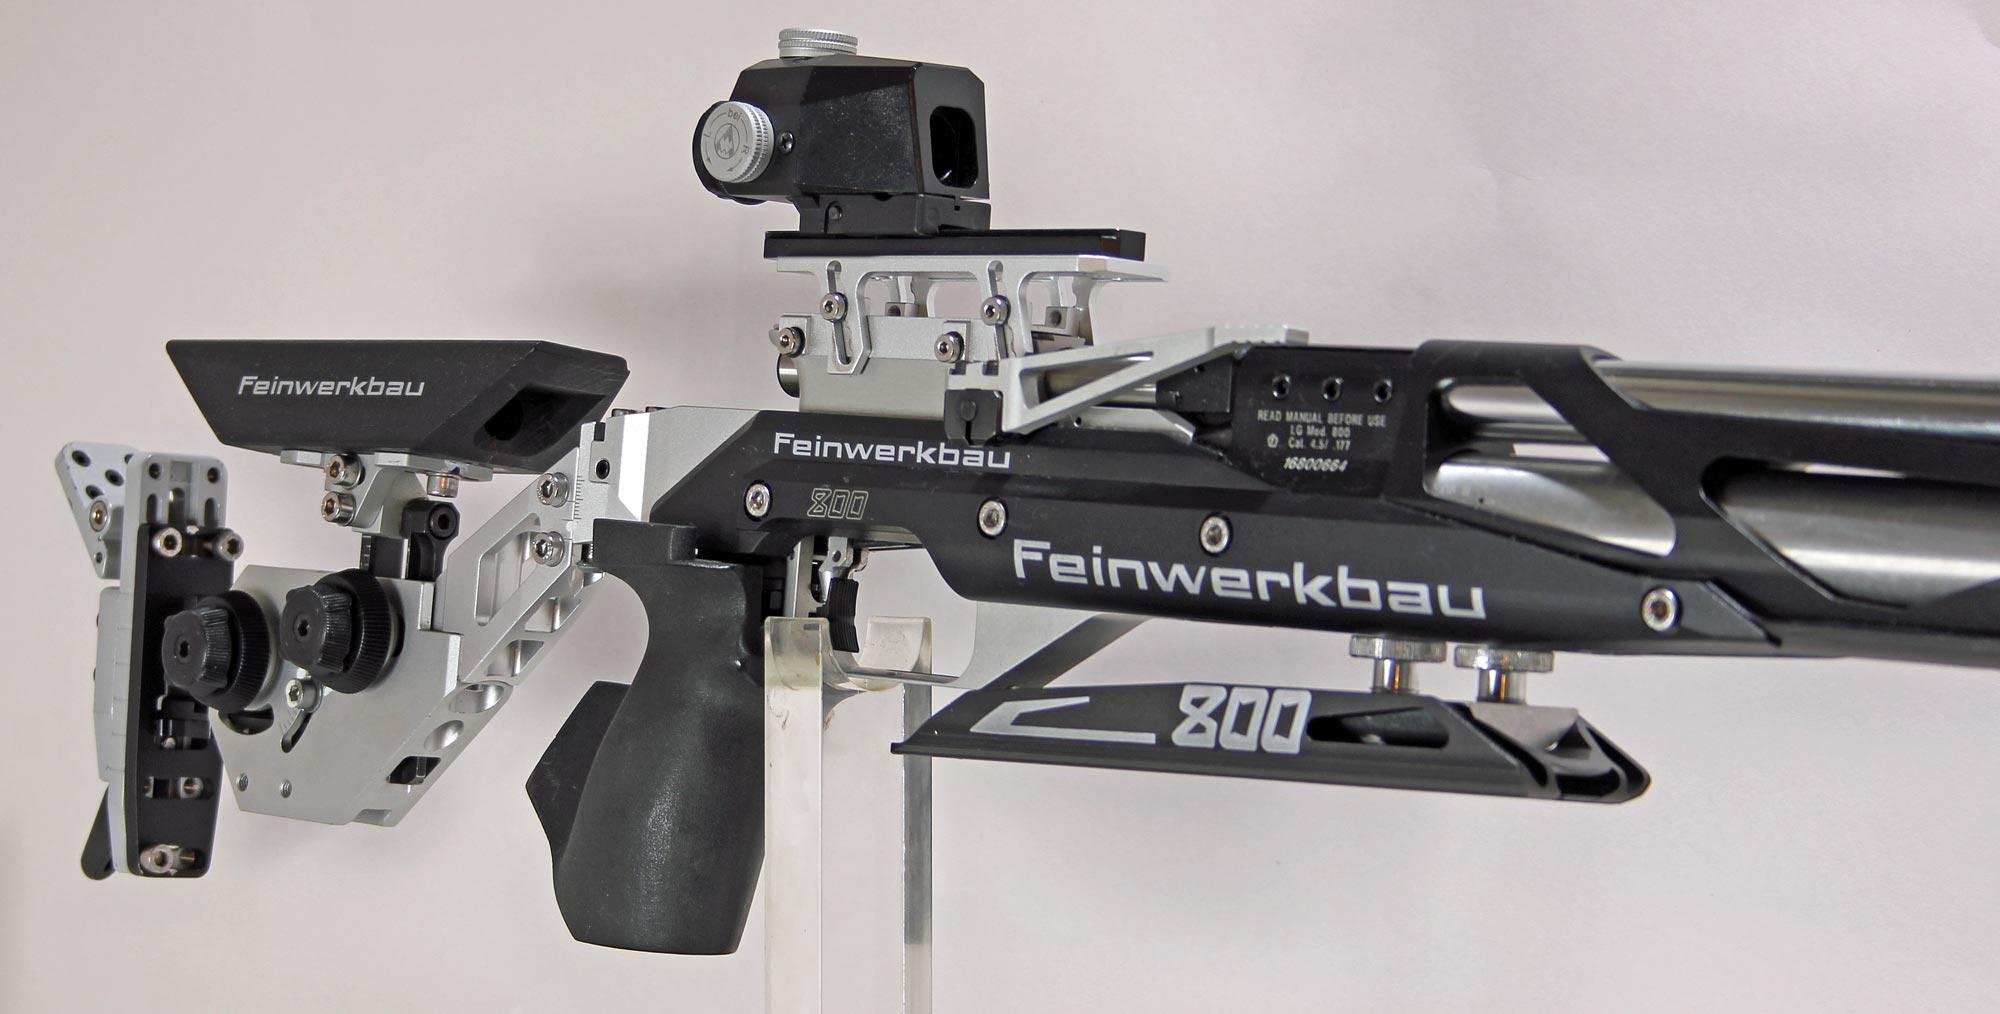 Feinwerkbau 800X